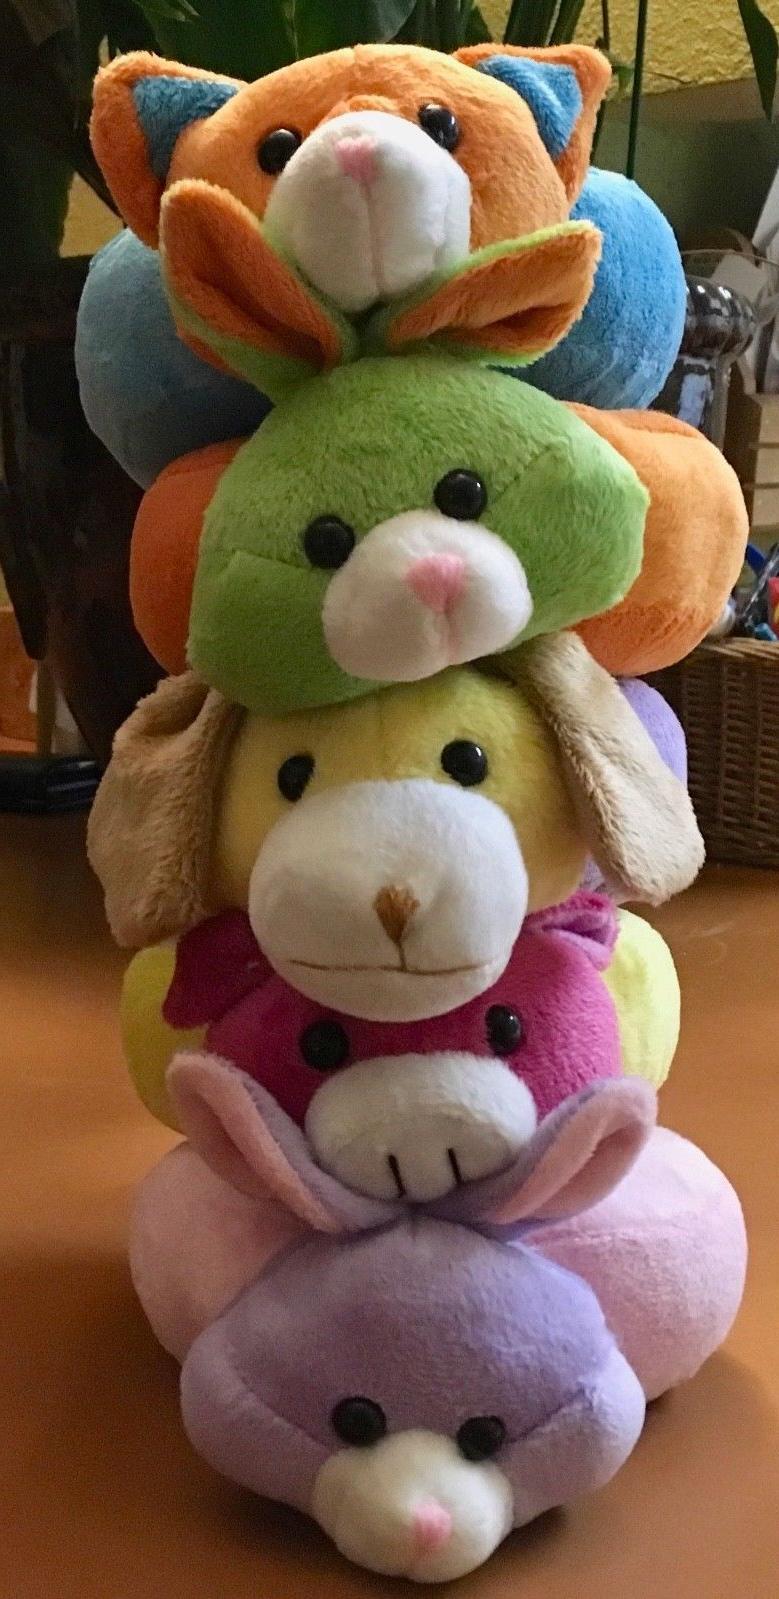 Lot of 5 Stuffed Ring Animals/Plush Toys